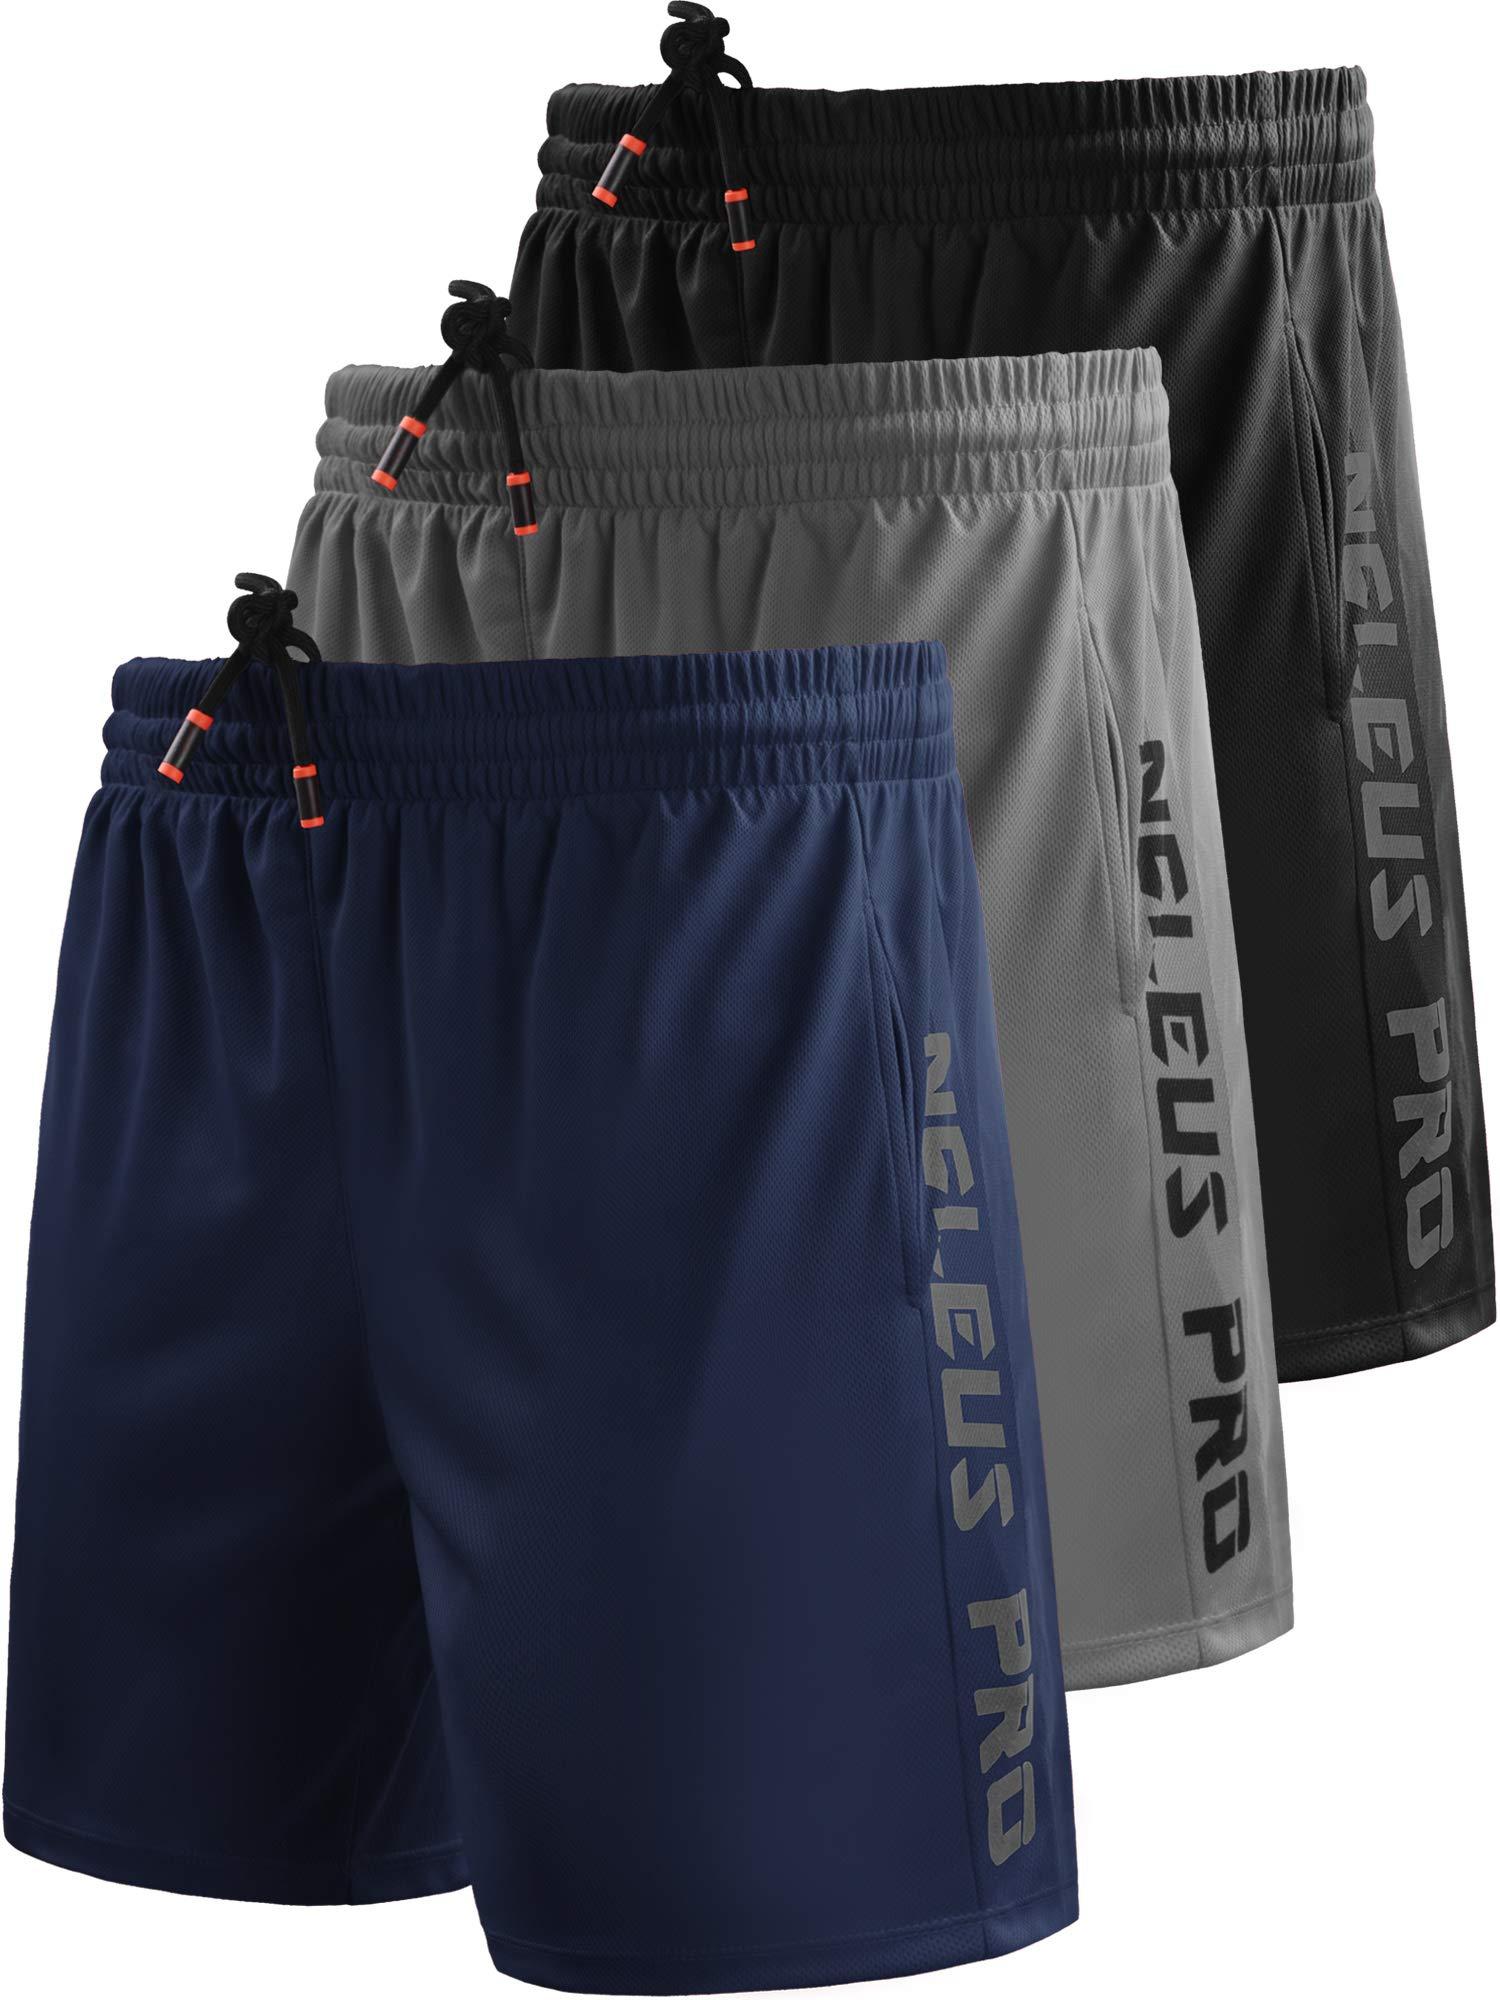 Neleus Men's 7'' Workout Running Shorts with Pockets,6056,3 Pack,Black/Grey/Navy Blue,XL,EU 2XL by Neleus